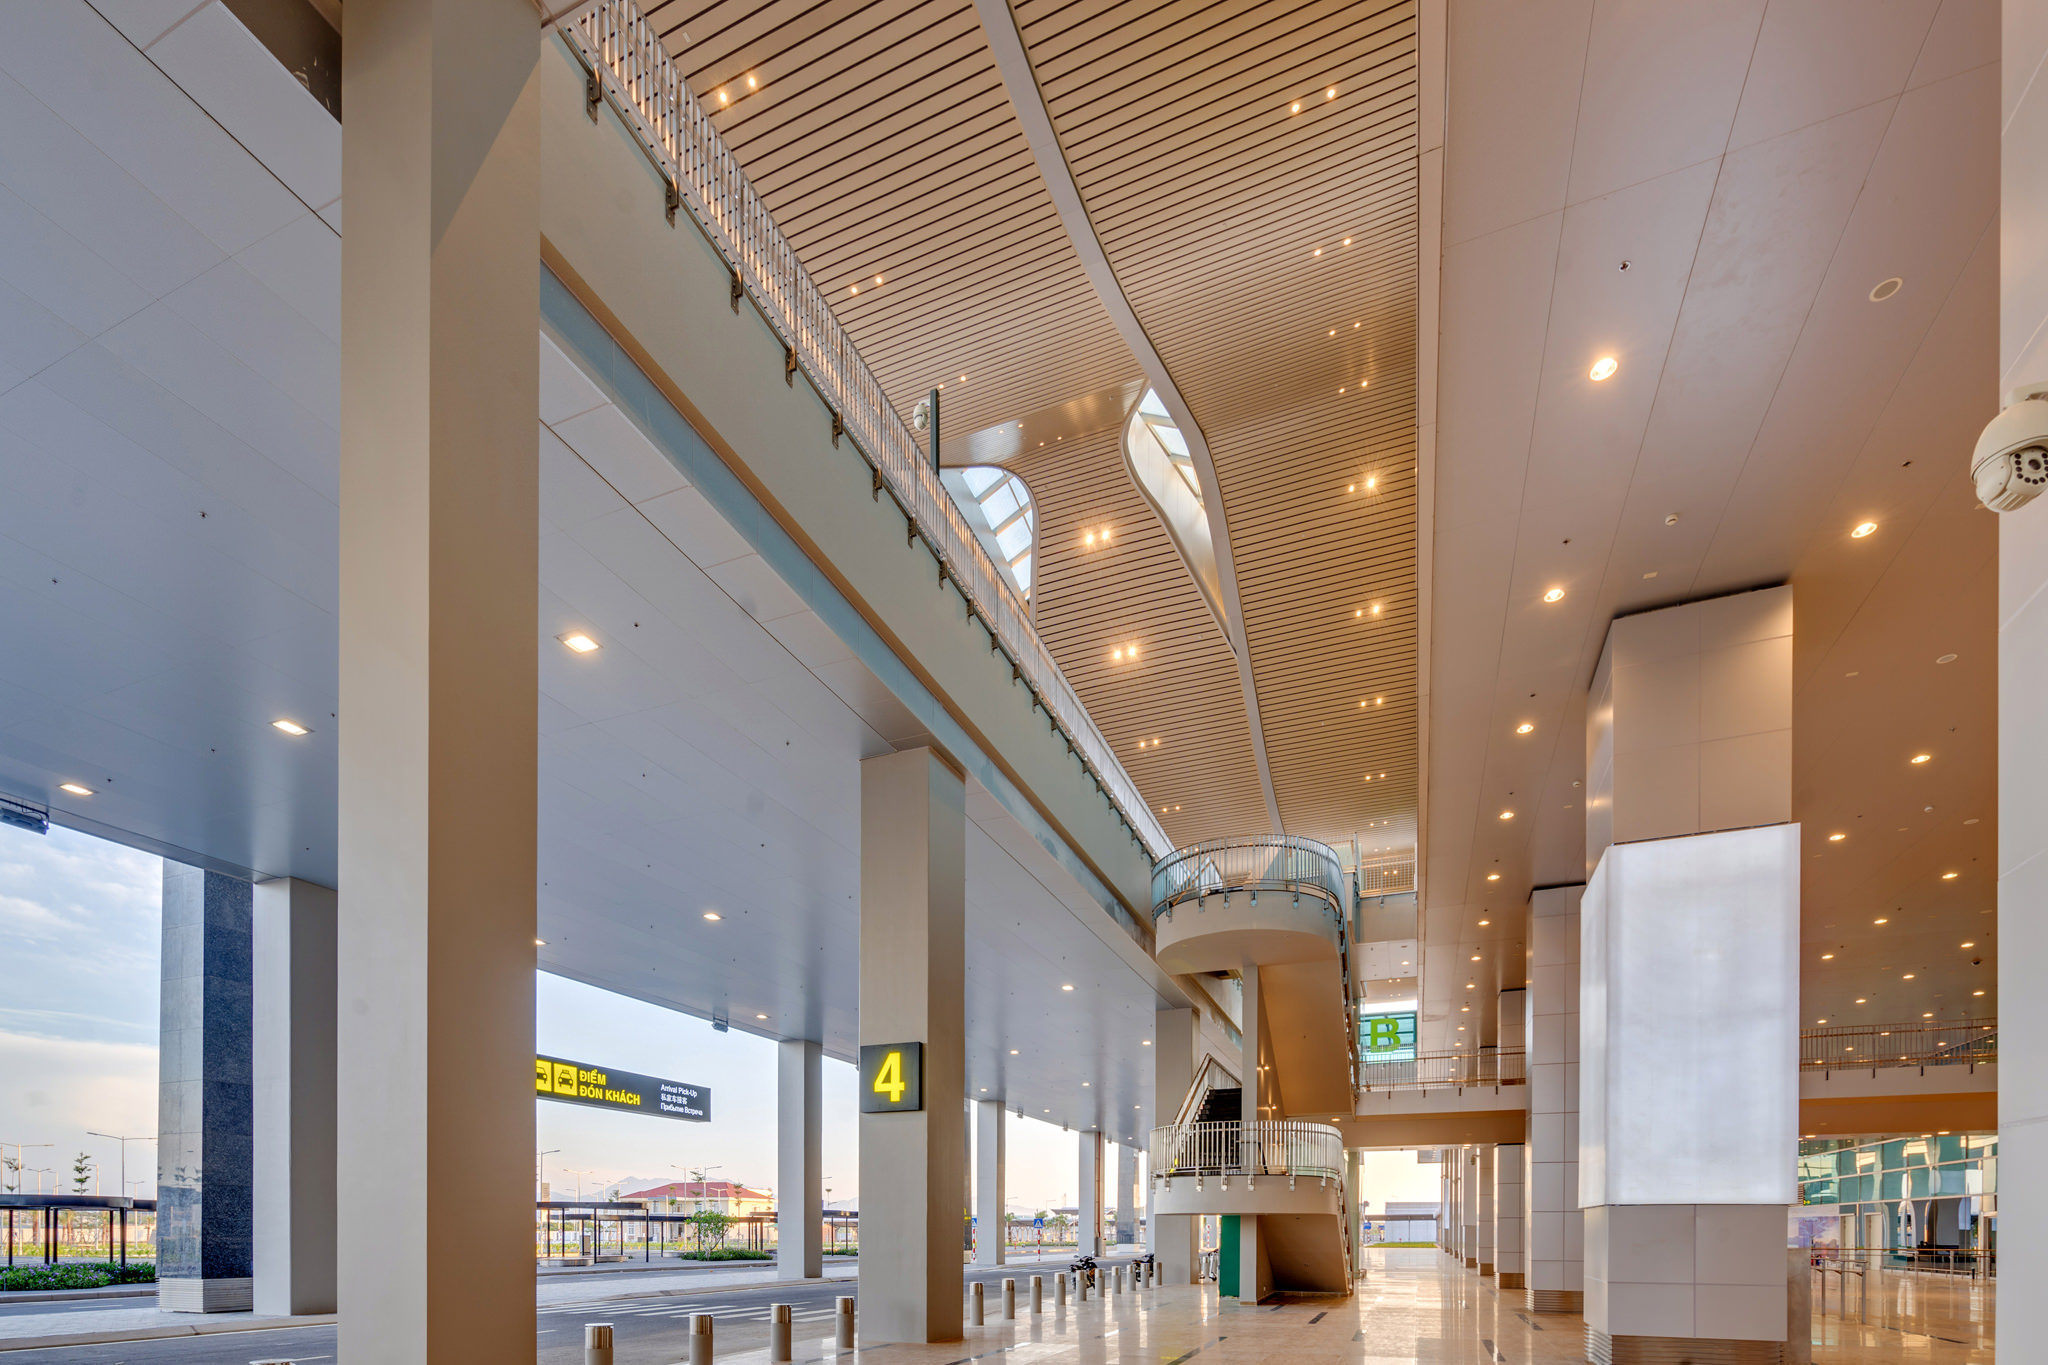 20180626 - Cam Ranh Airport - Architecture - 0040.jpg